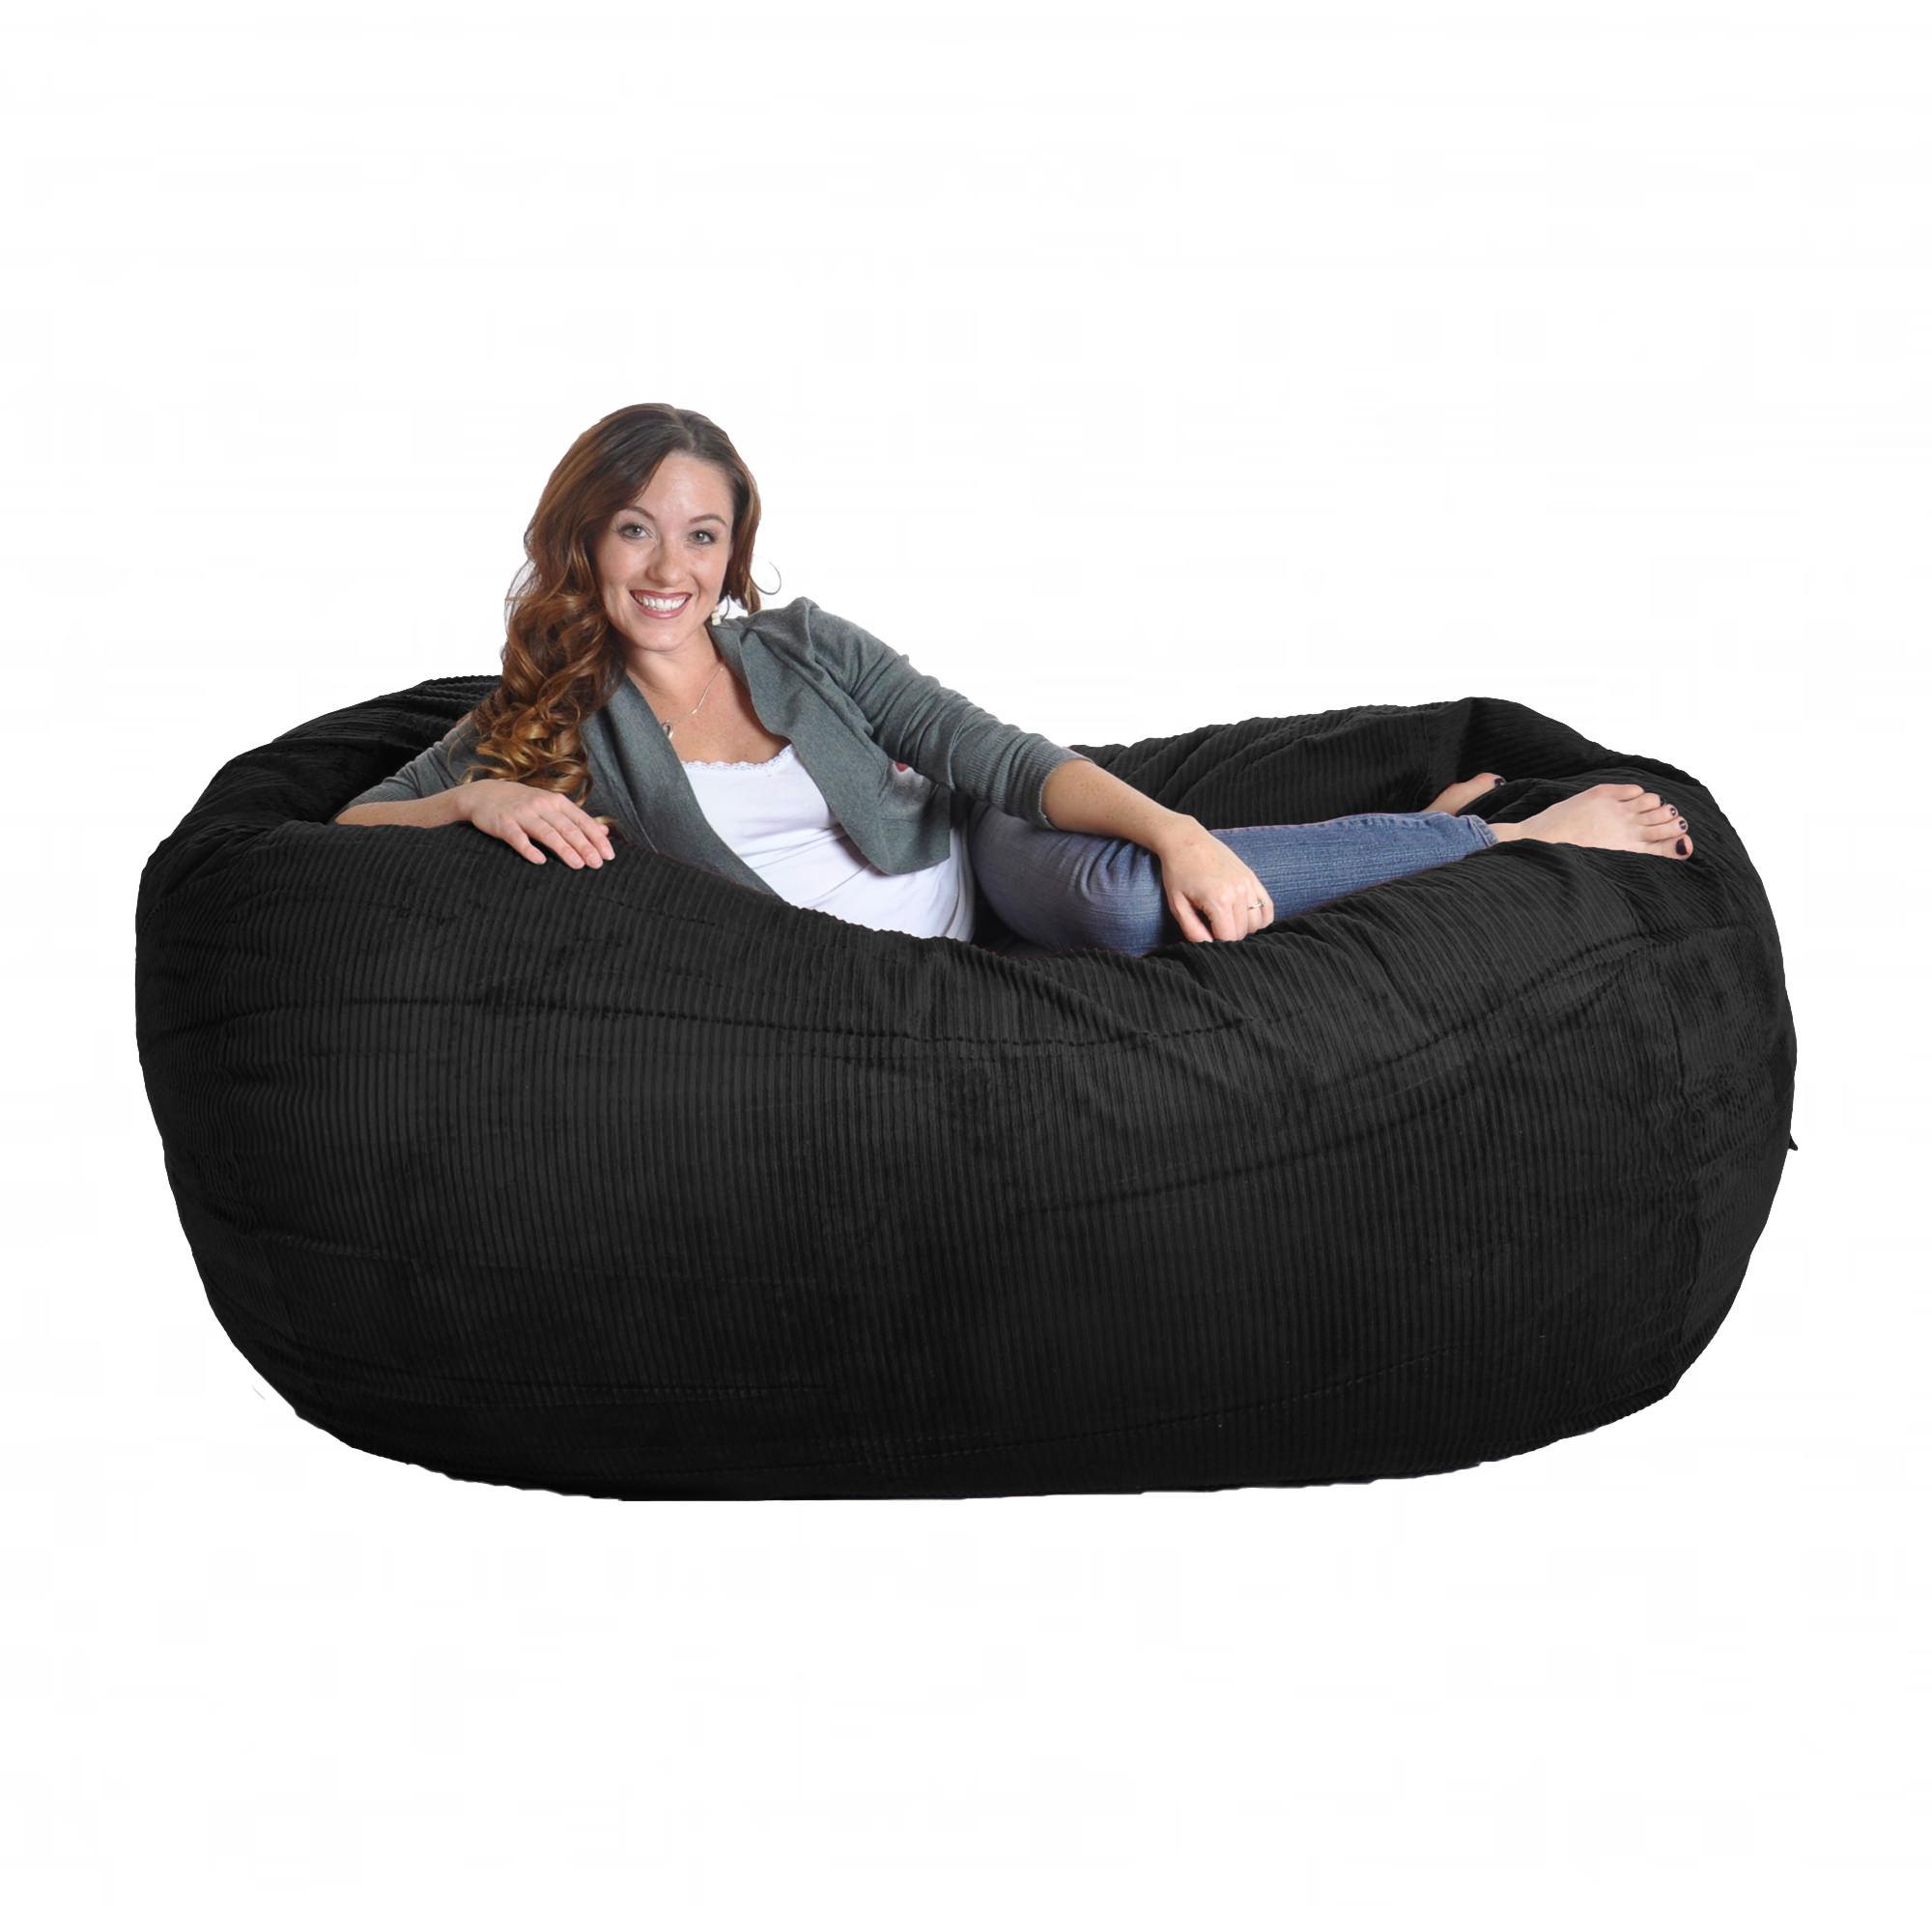 Slacker Sack Sofa Beanbag Black Corduroy